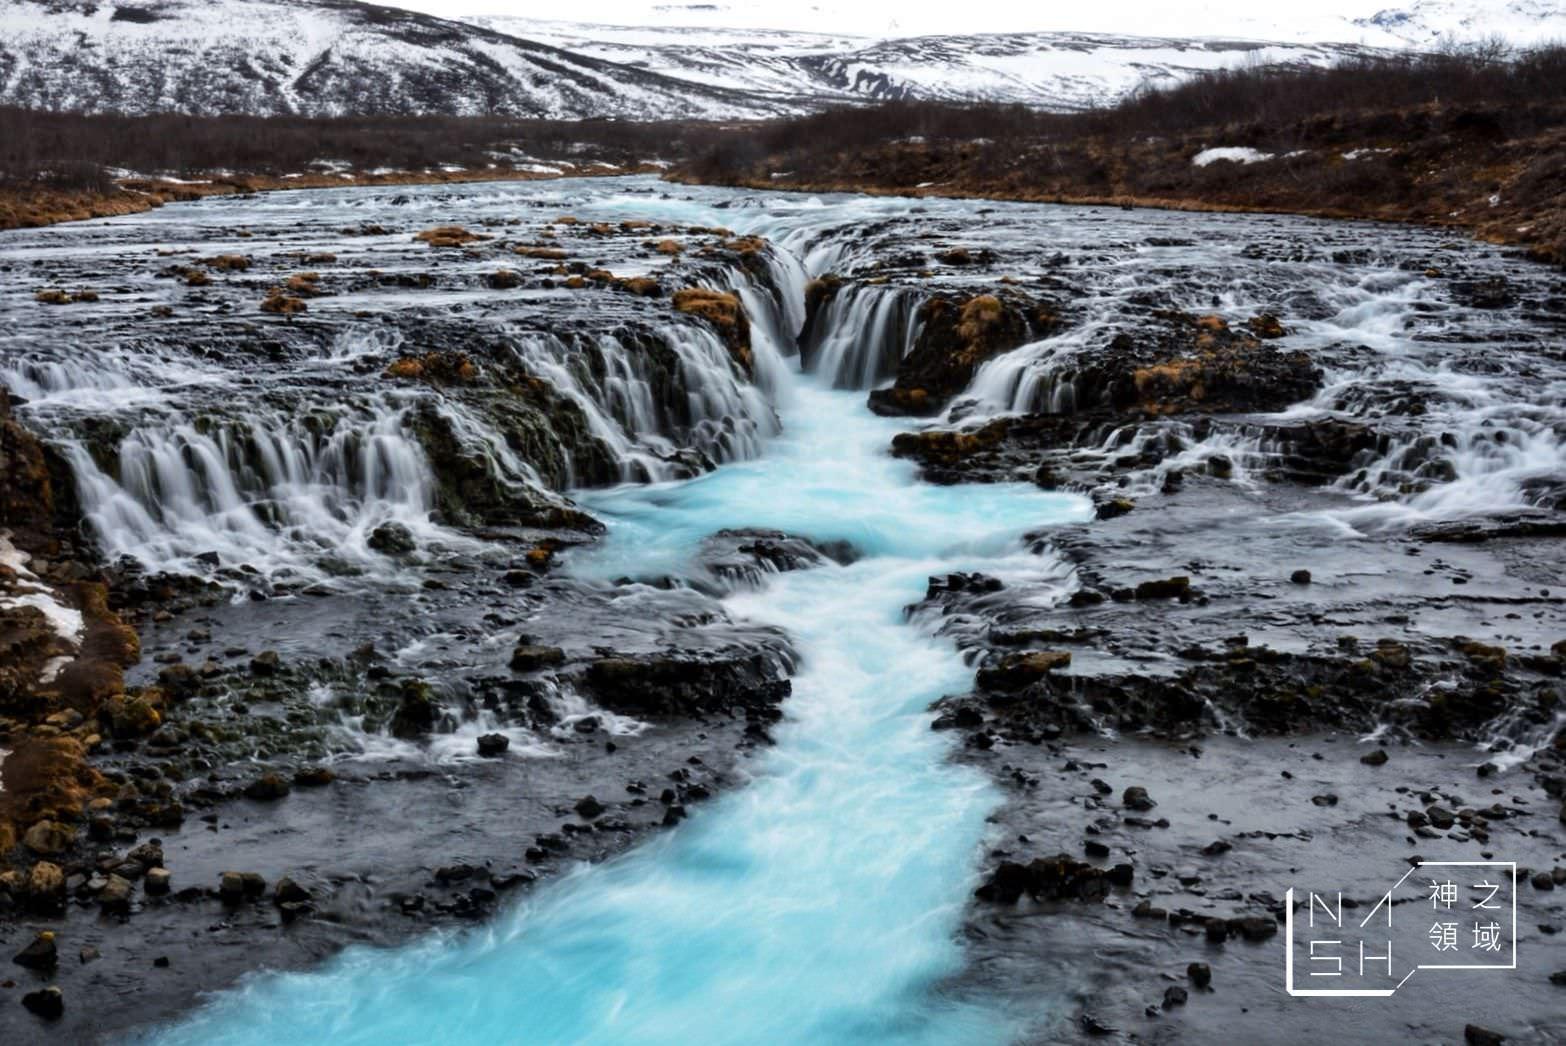 Bruarfoss Waterfall,蒂芬尼藍瀑布,冰島黃金圈景點 @Nash,神之領域